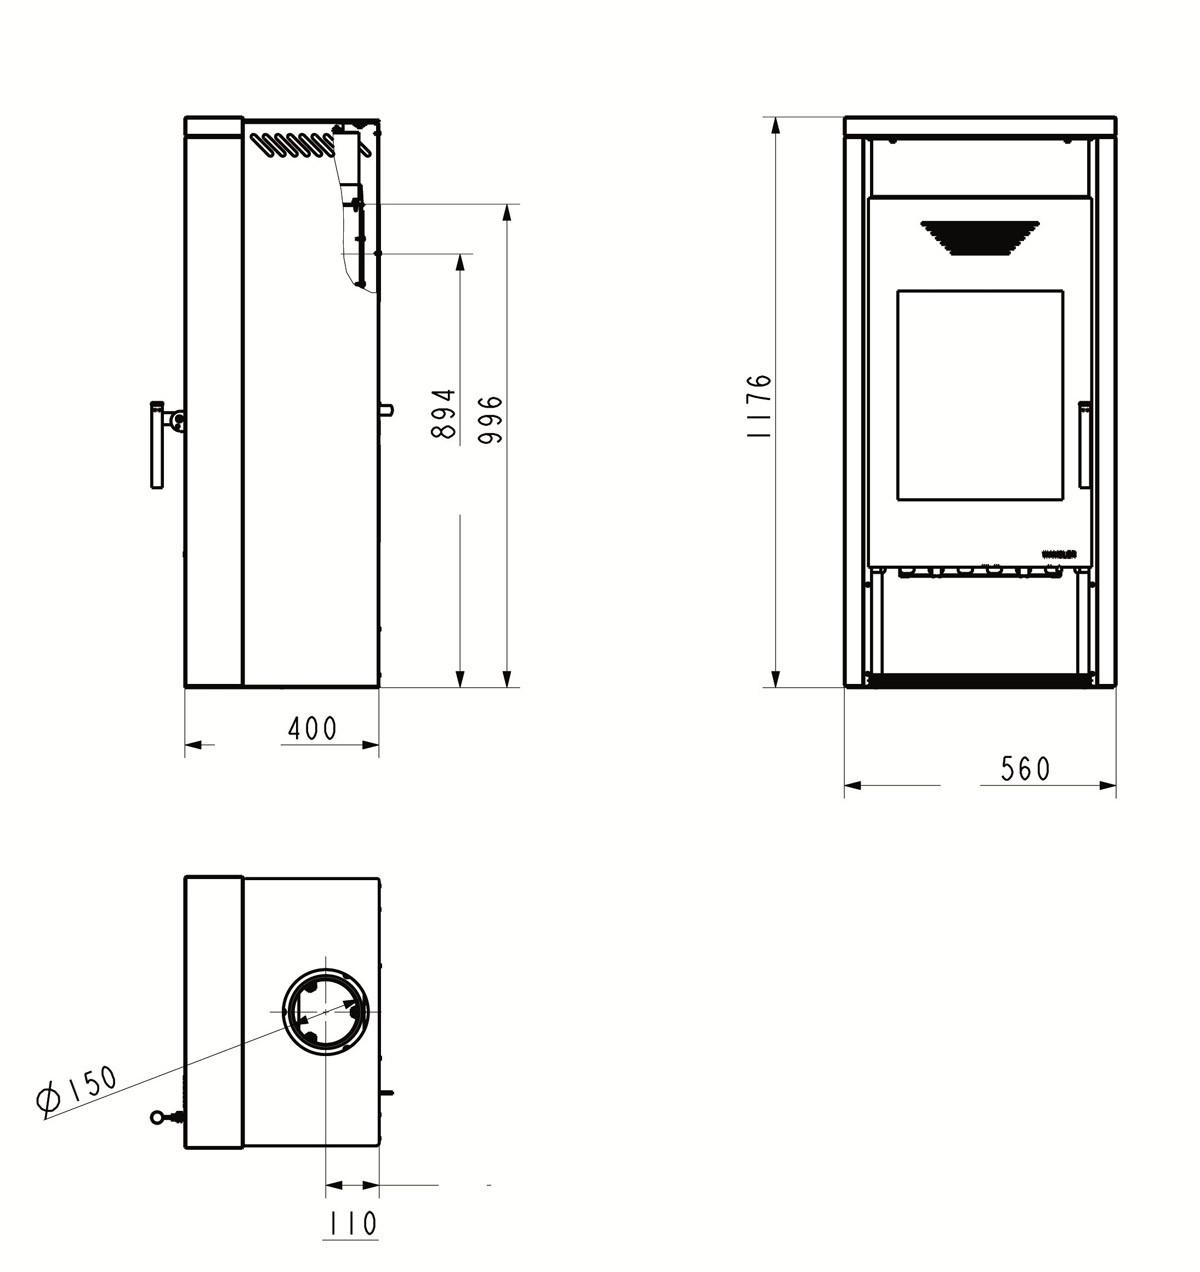 kaminofen wamsler kf 101 yara stahl sandstein 8 kw bei. Black Bedroom Furniture Sets. Home Design Ideas